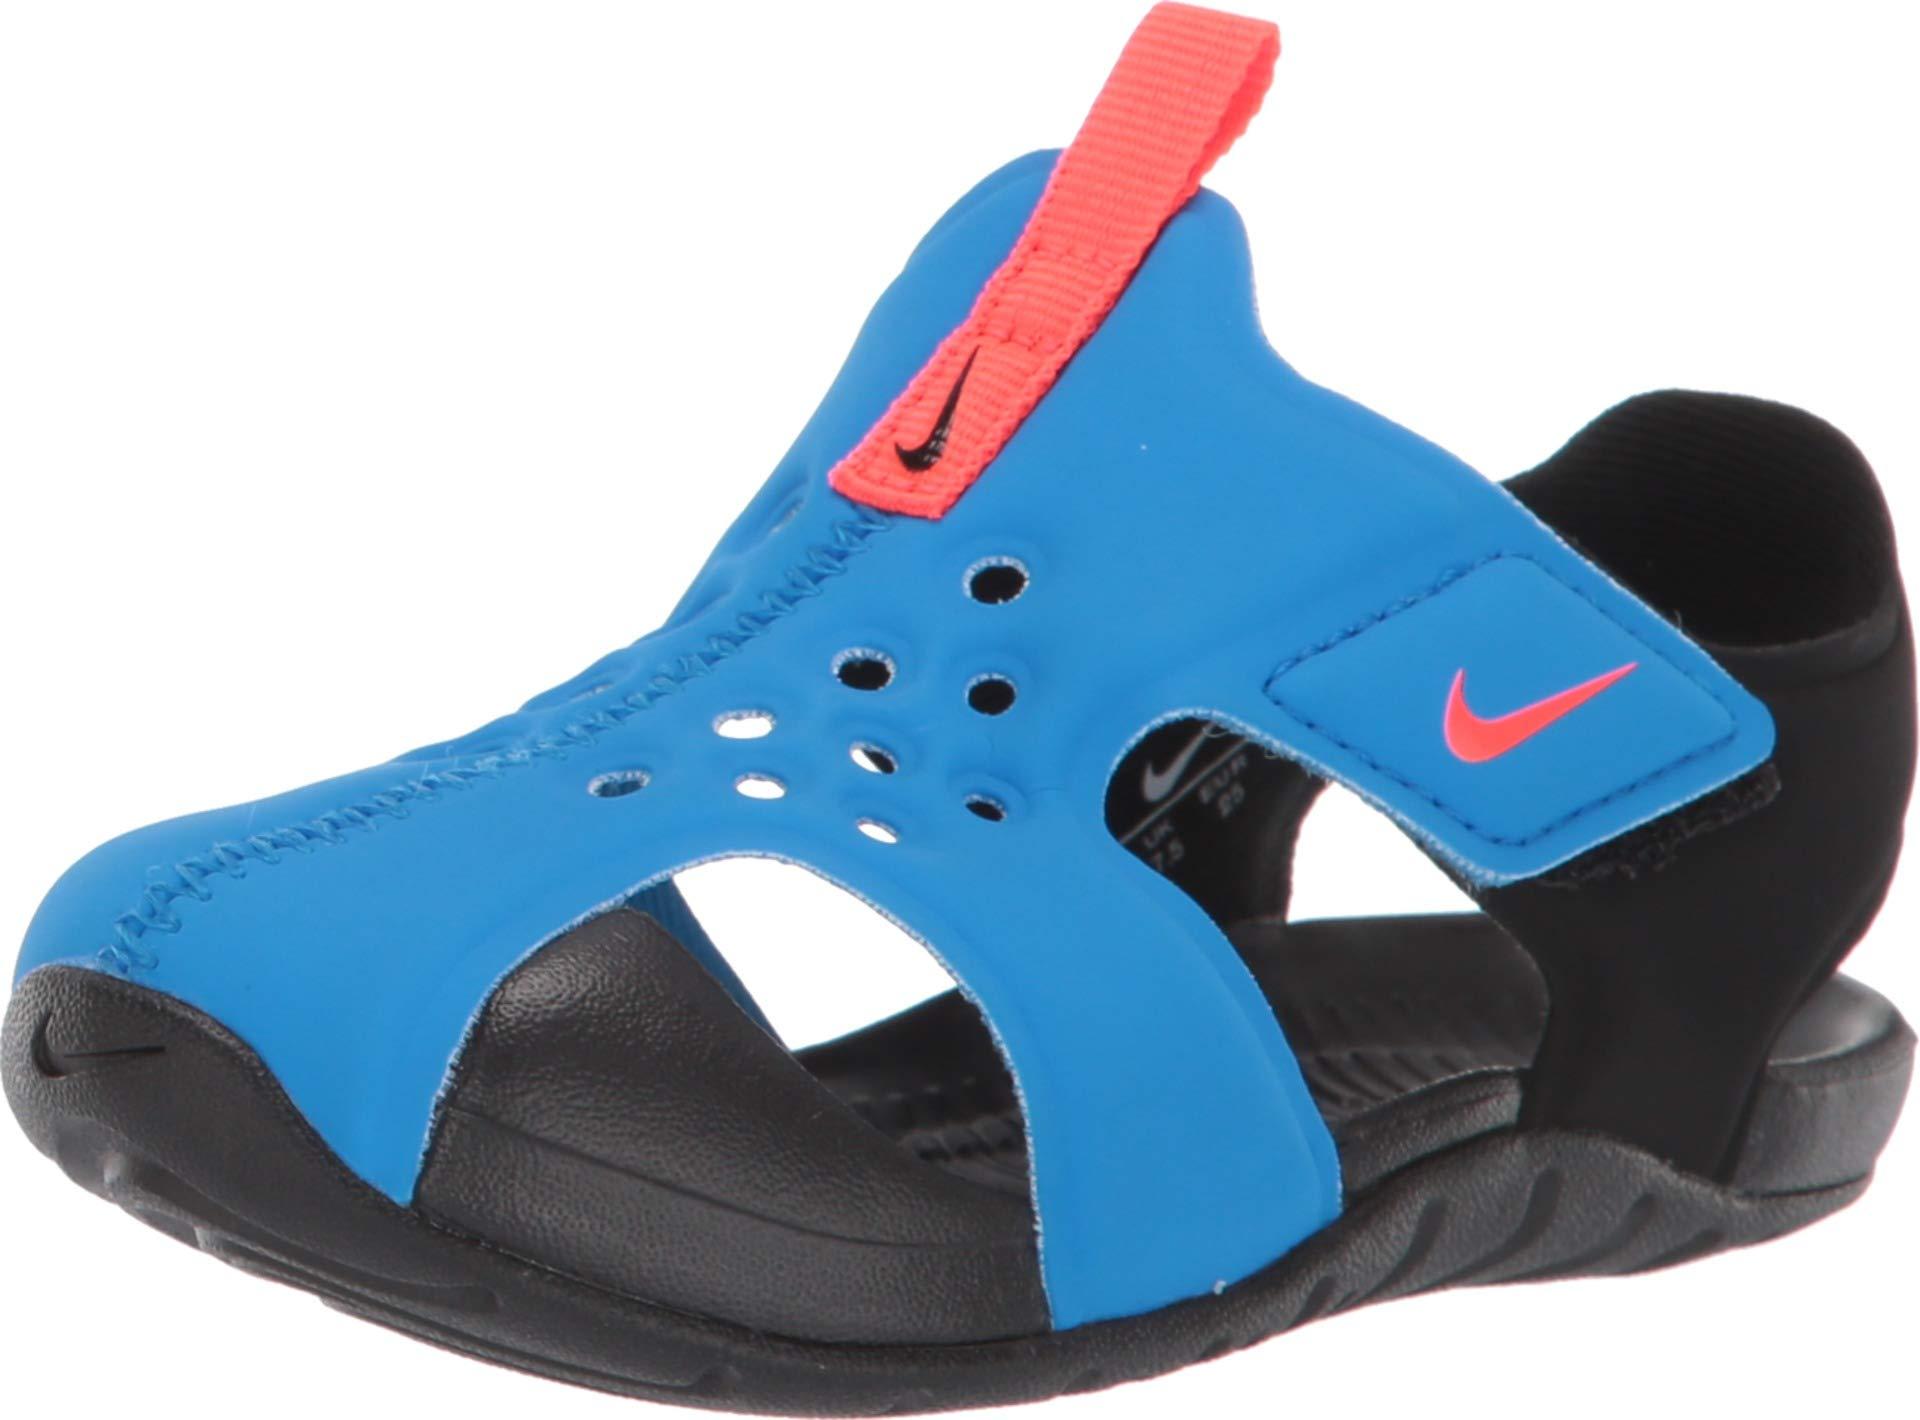 Nike Toddler Kid's Sunray Protect 2 Sandal, Photo Blue/Bright Crimson-Black, 7 M US Toddler